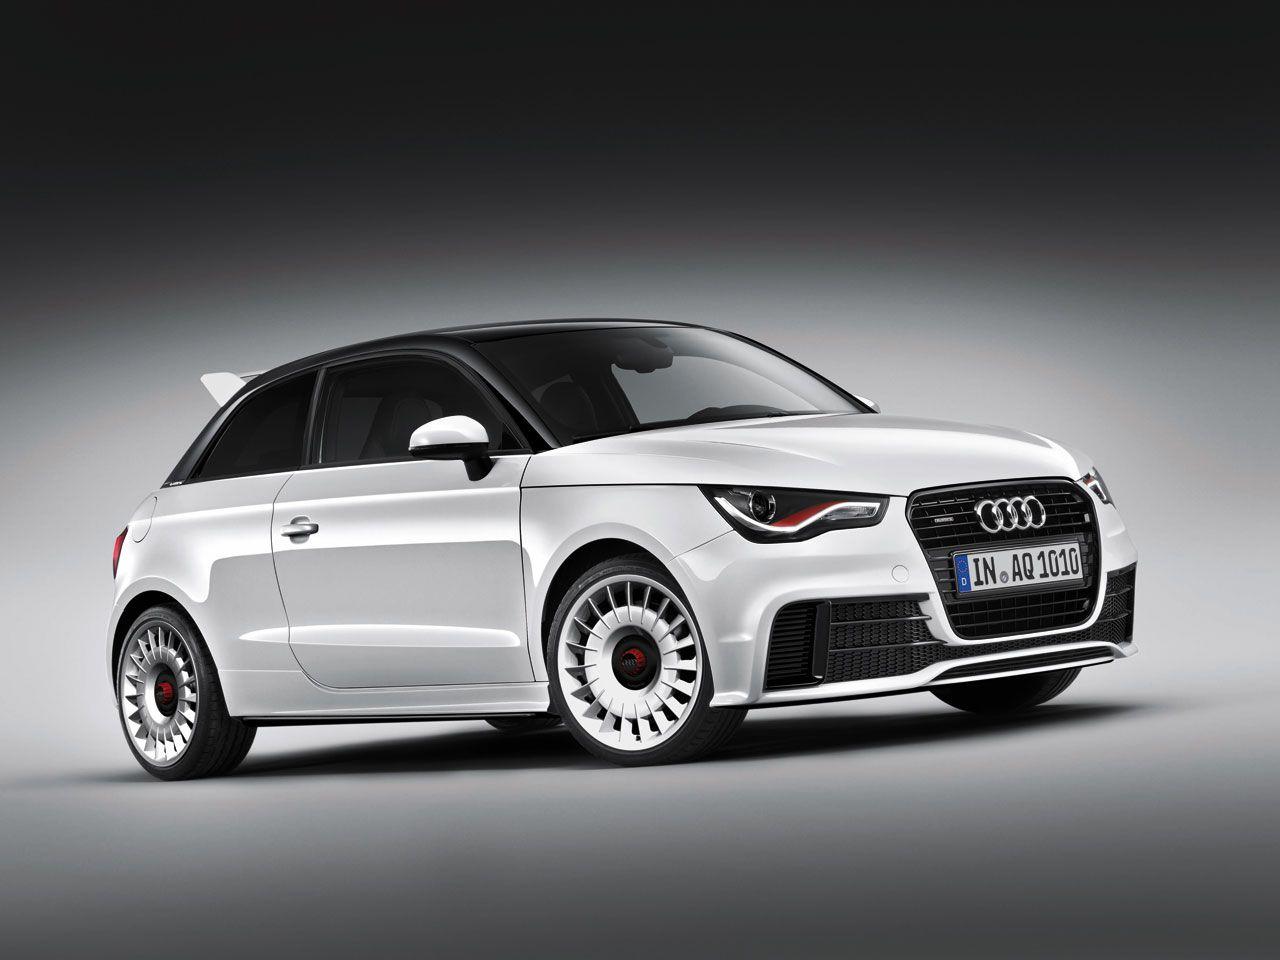 Audi A1 Quattro Audi A1 Audi Autos